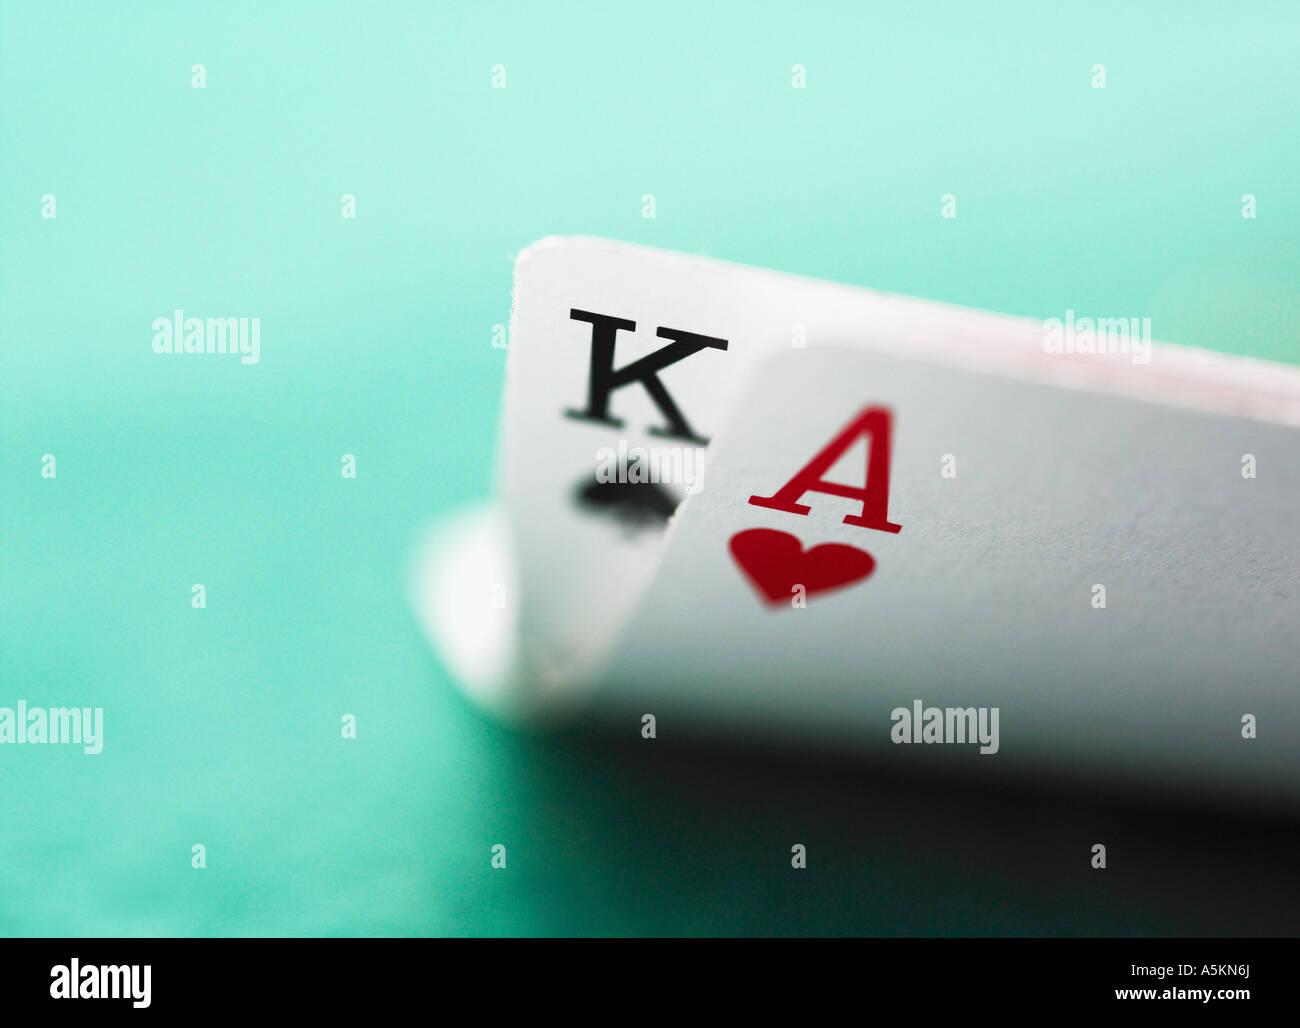 Close up of winning blackjack hand - Stock Image